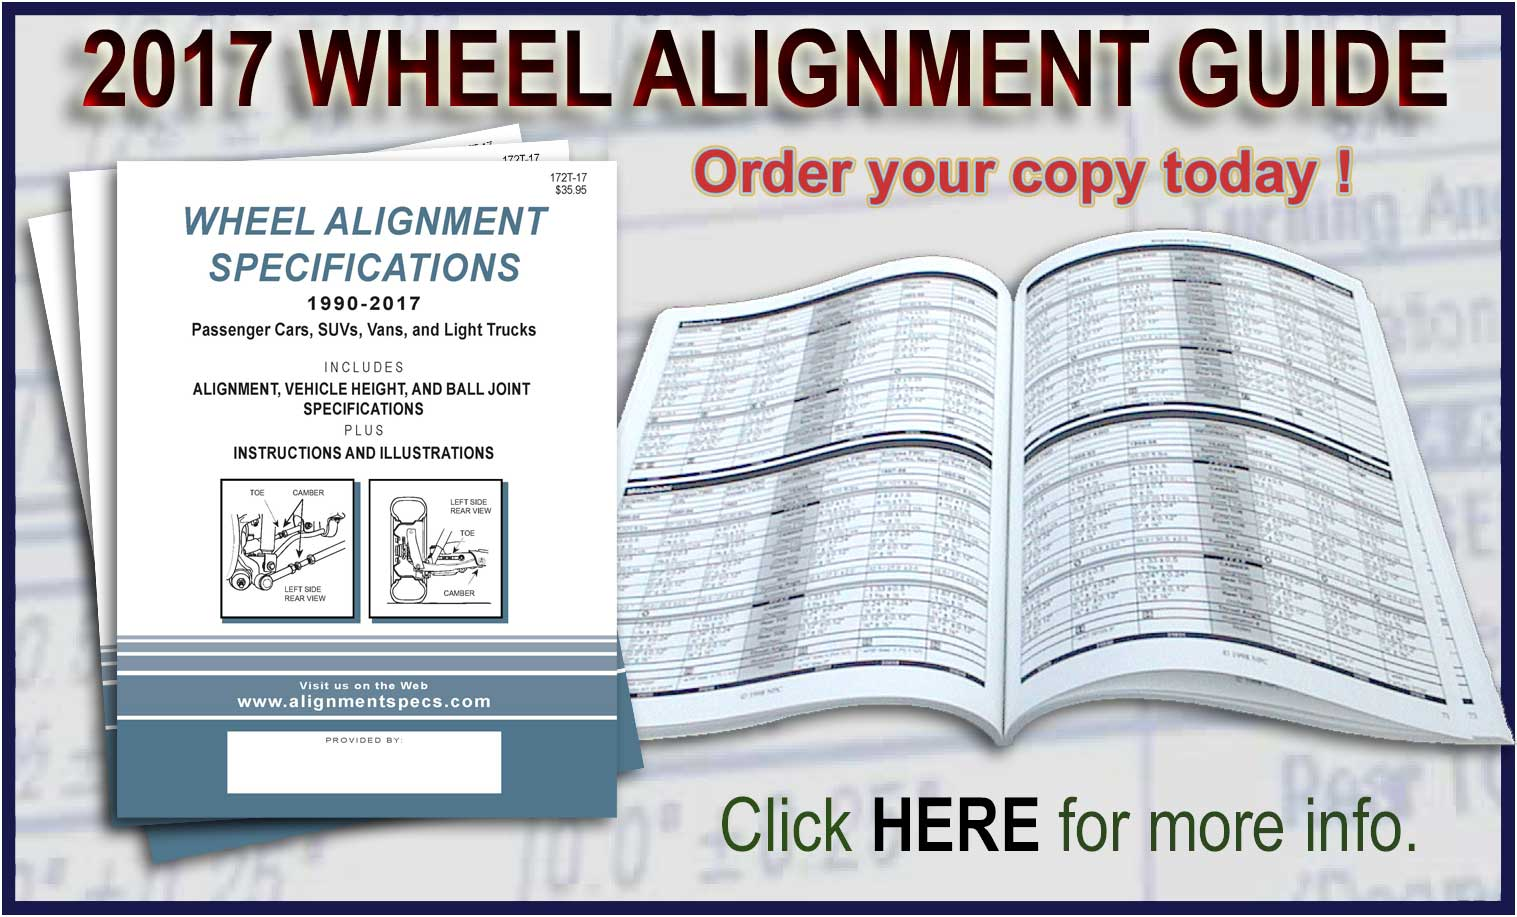 AlignmentSpecs.com Online Wheel Alignment Specs, Data Books and CDs